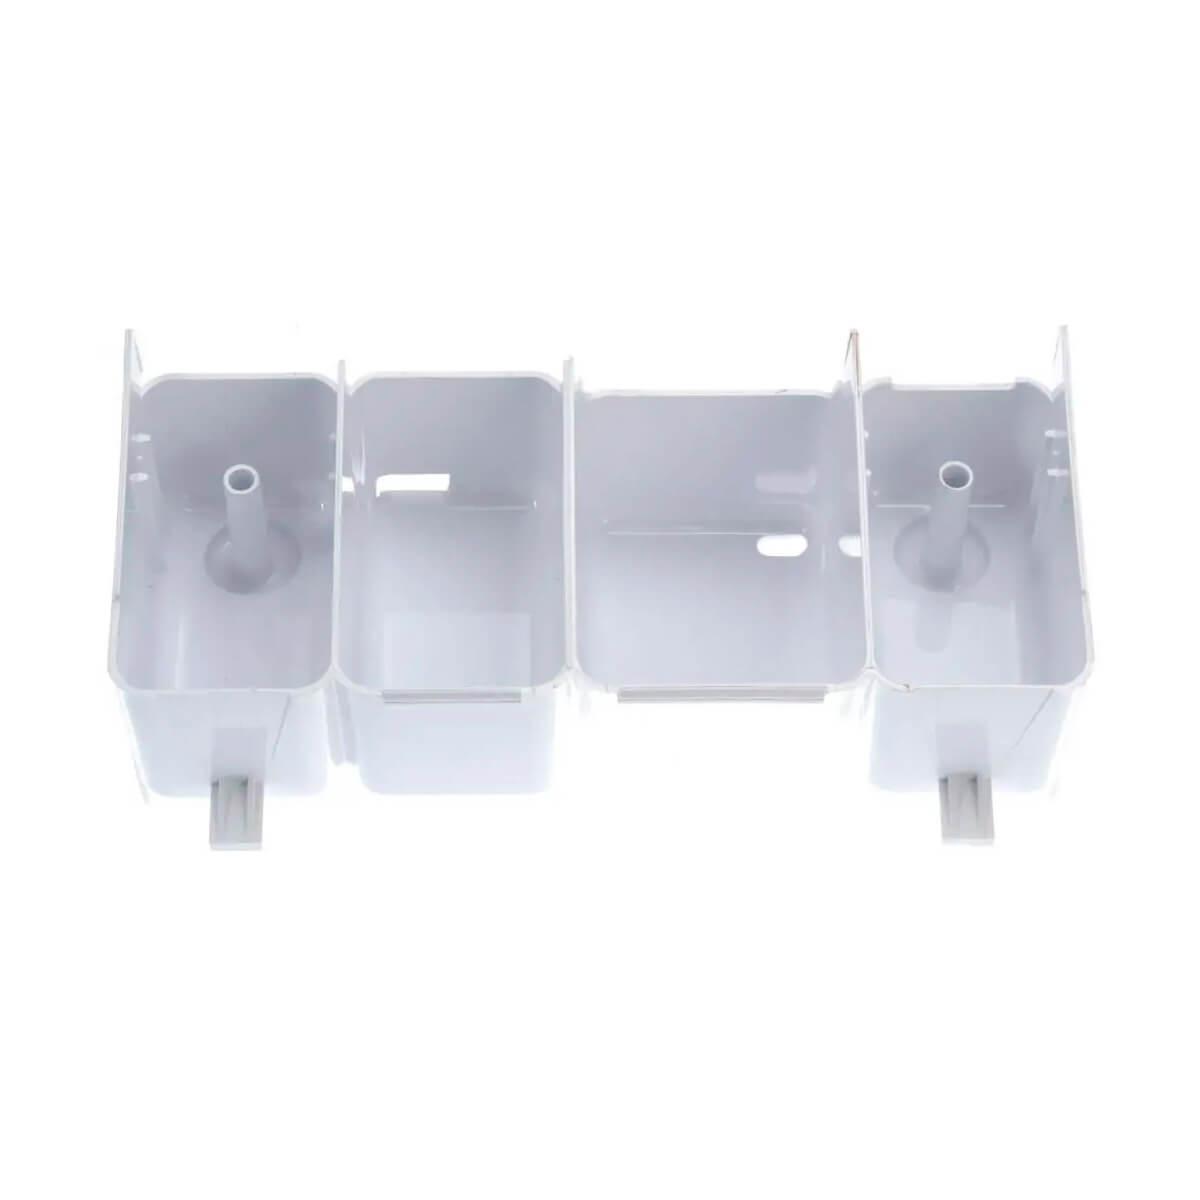 Gaveta Dispenser Lavadora De Roupas Brastemp - W10217326